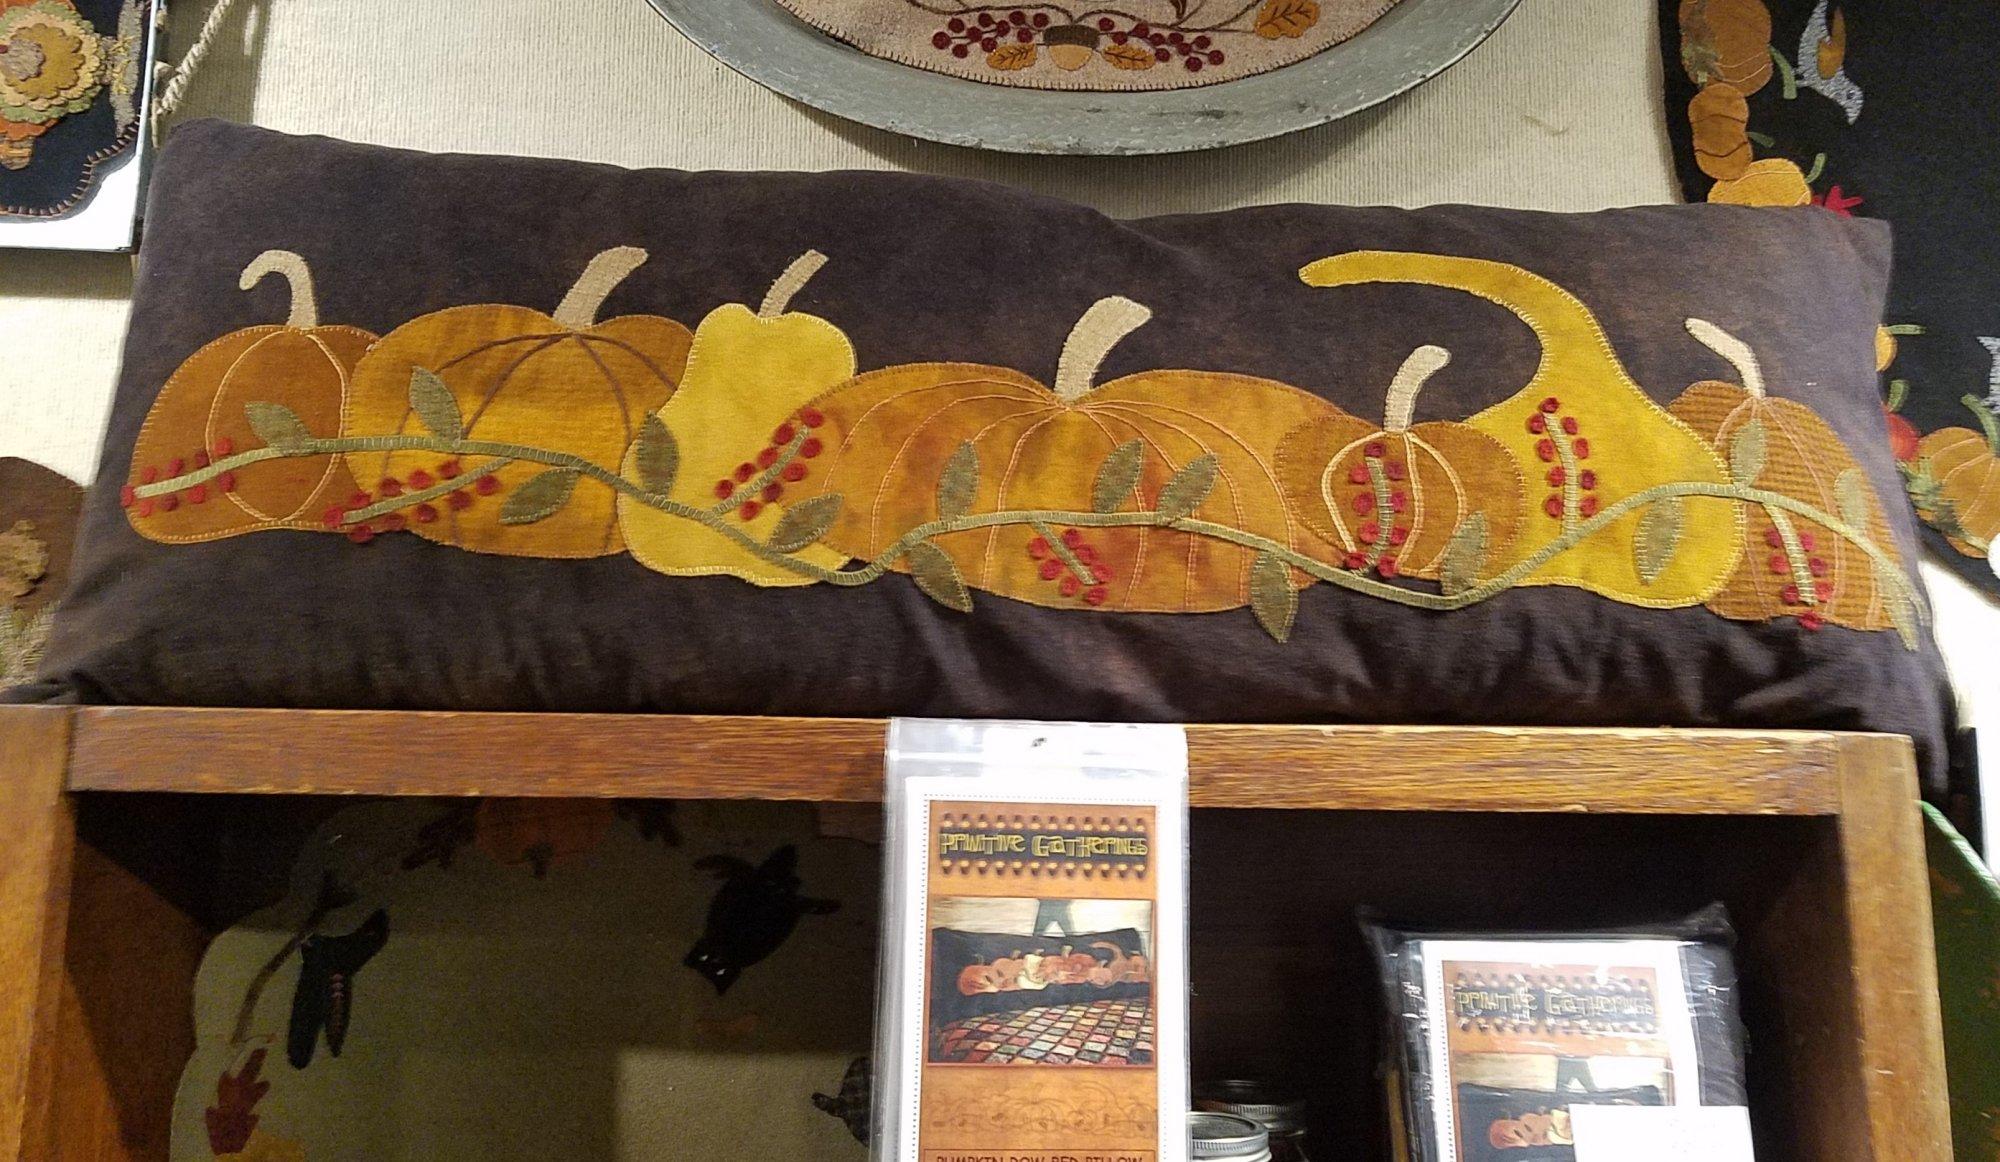 Valdani Pumpkin Row Bed Pillow Collection of 7 Threads